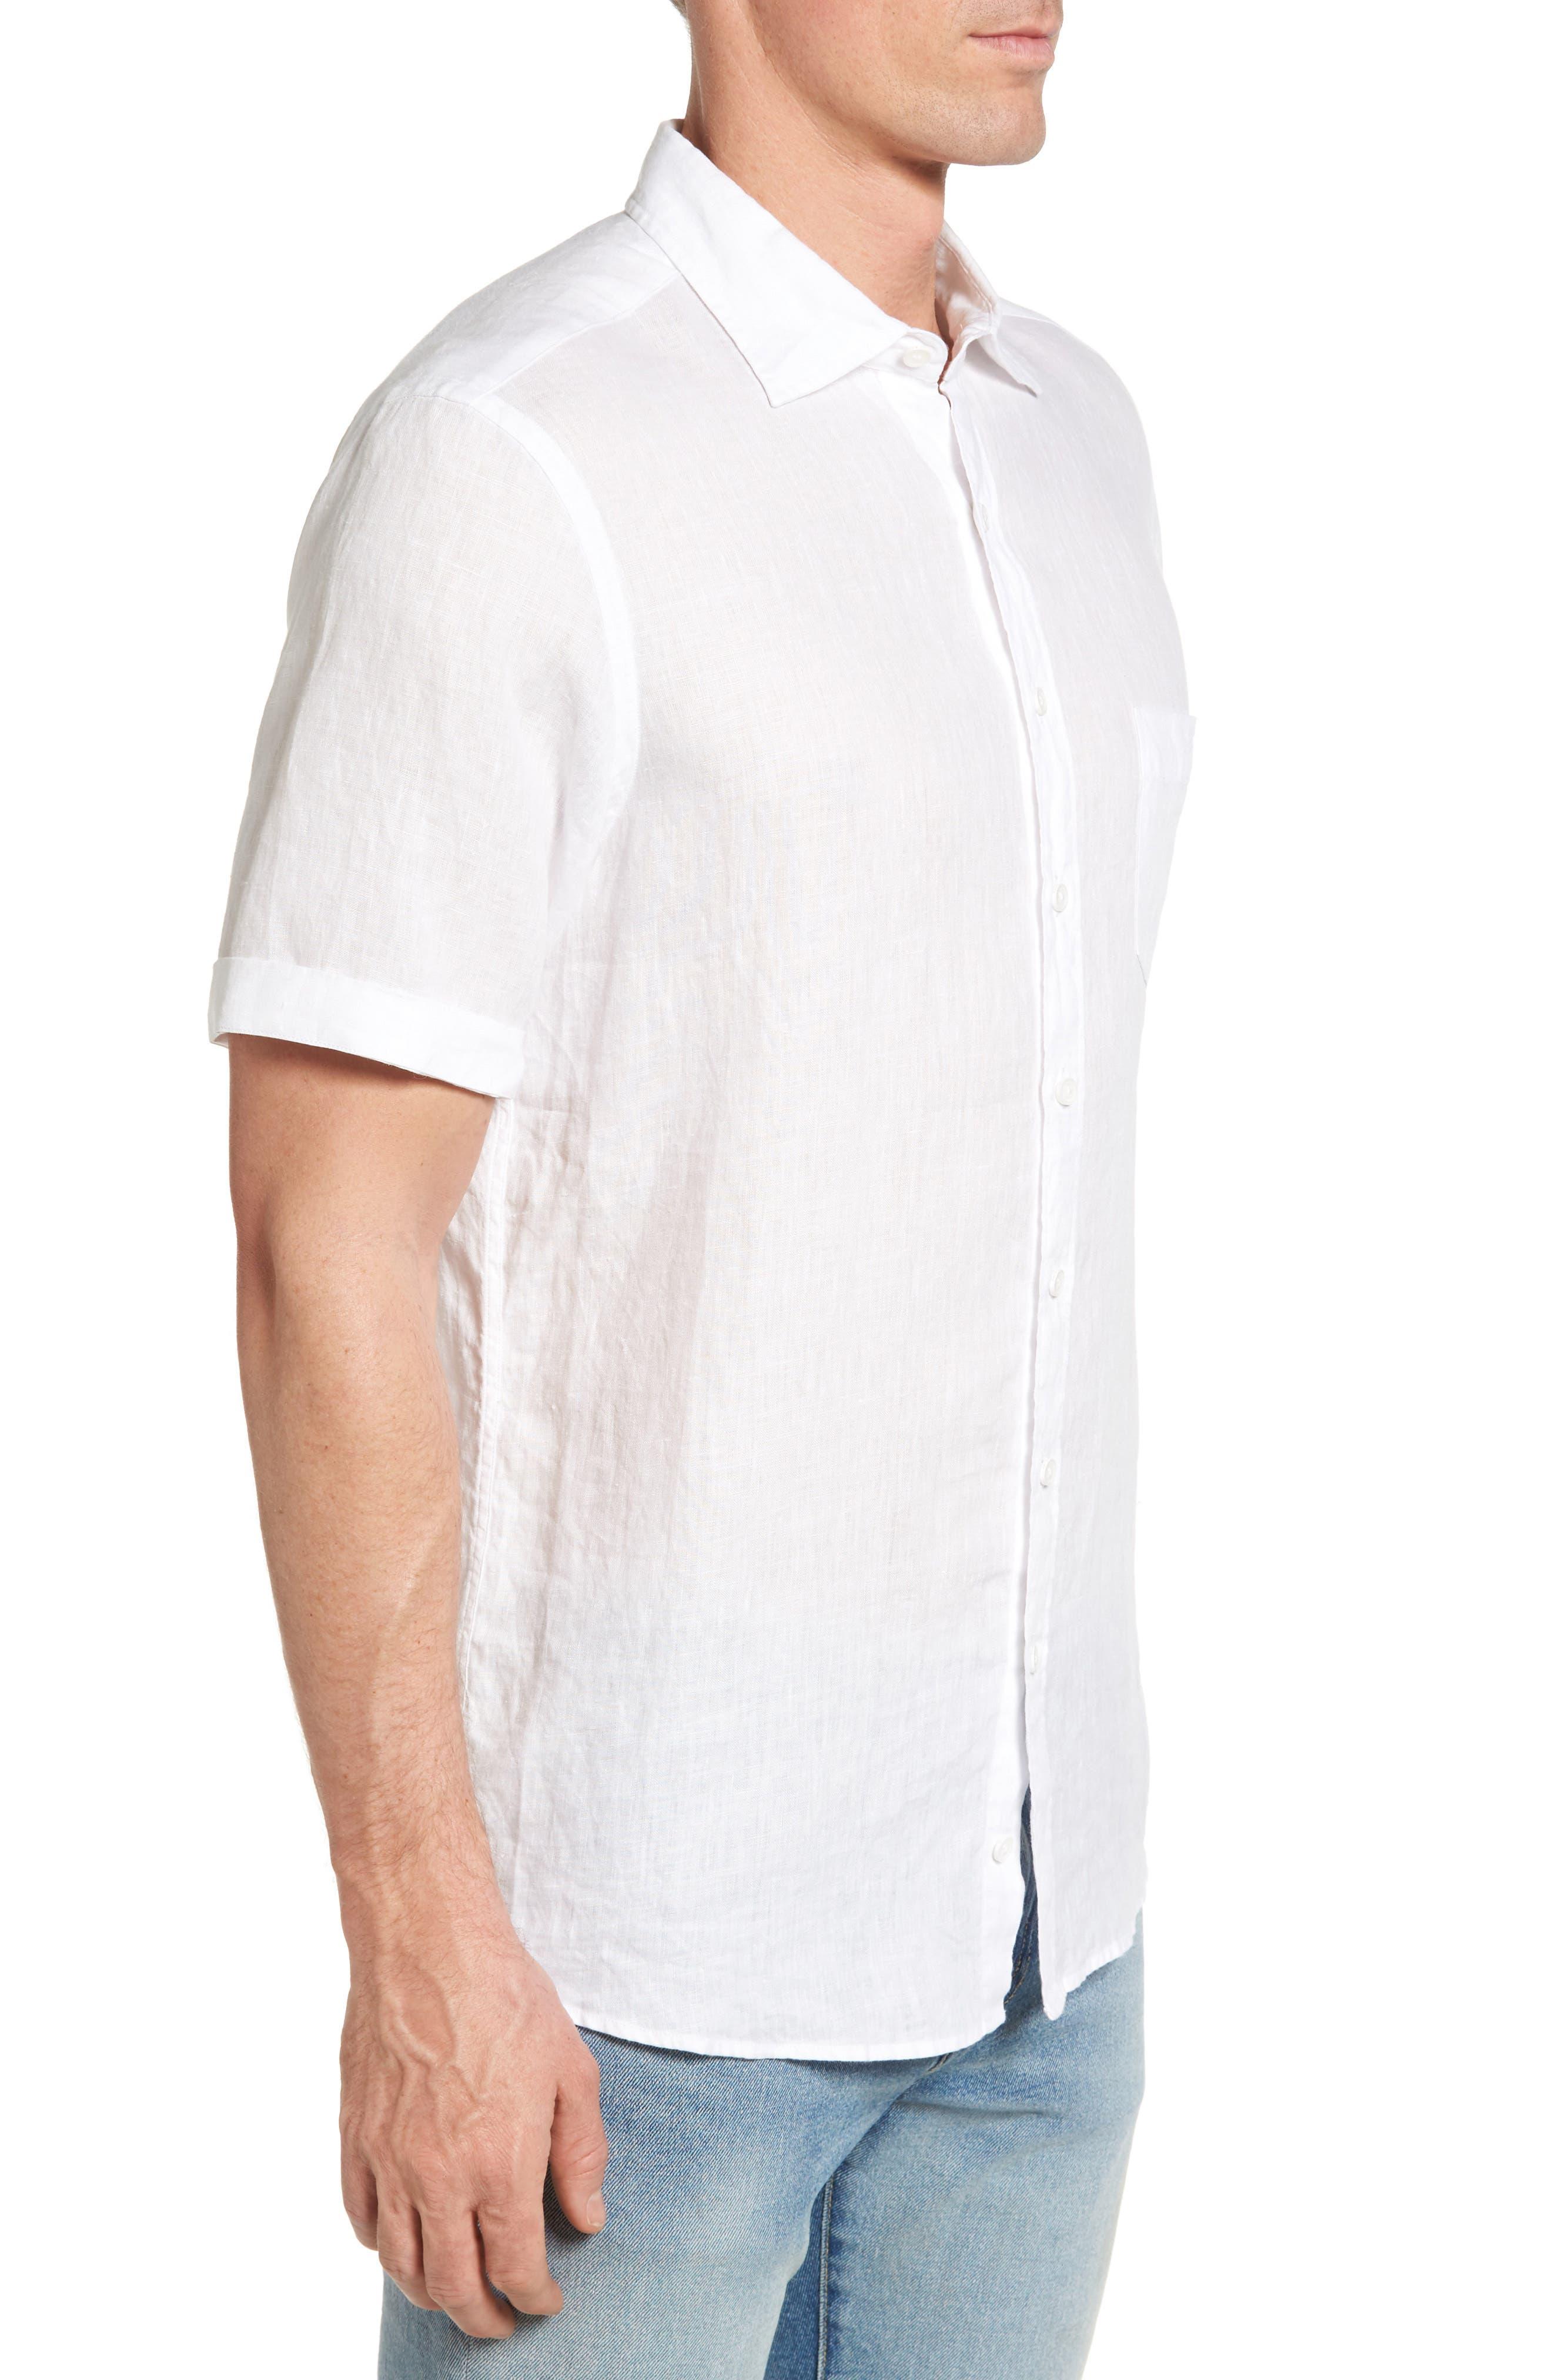 Abbotleight Linen Sport Shirt,                             Alternate thumbnail 3, color,                             SNOW